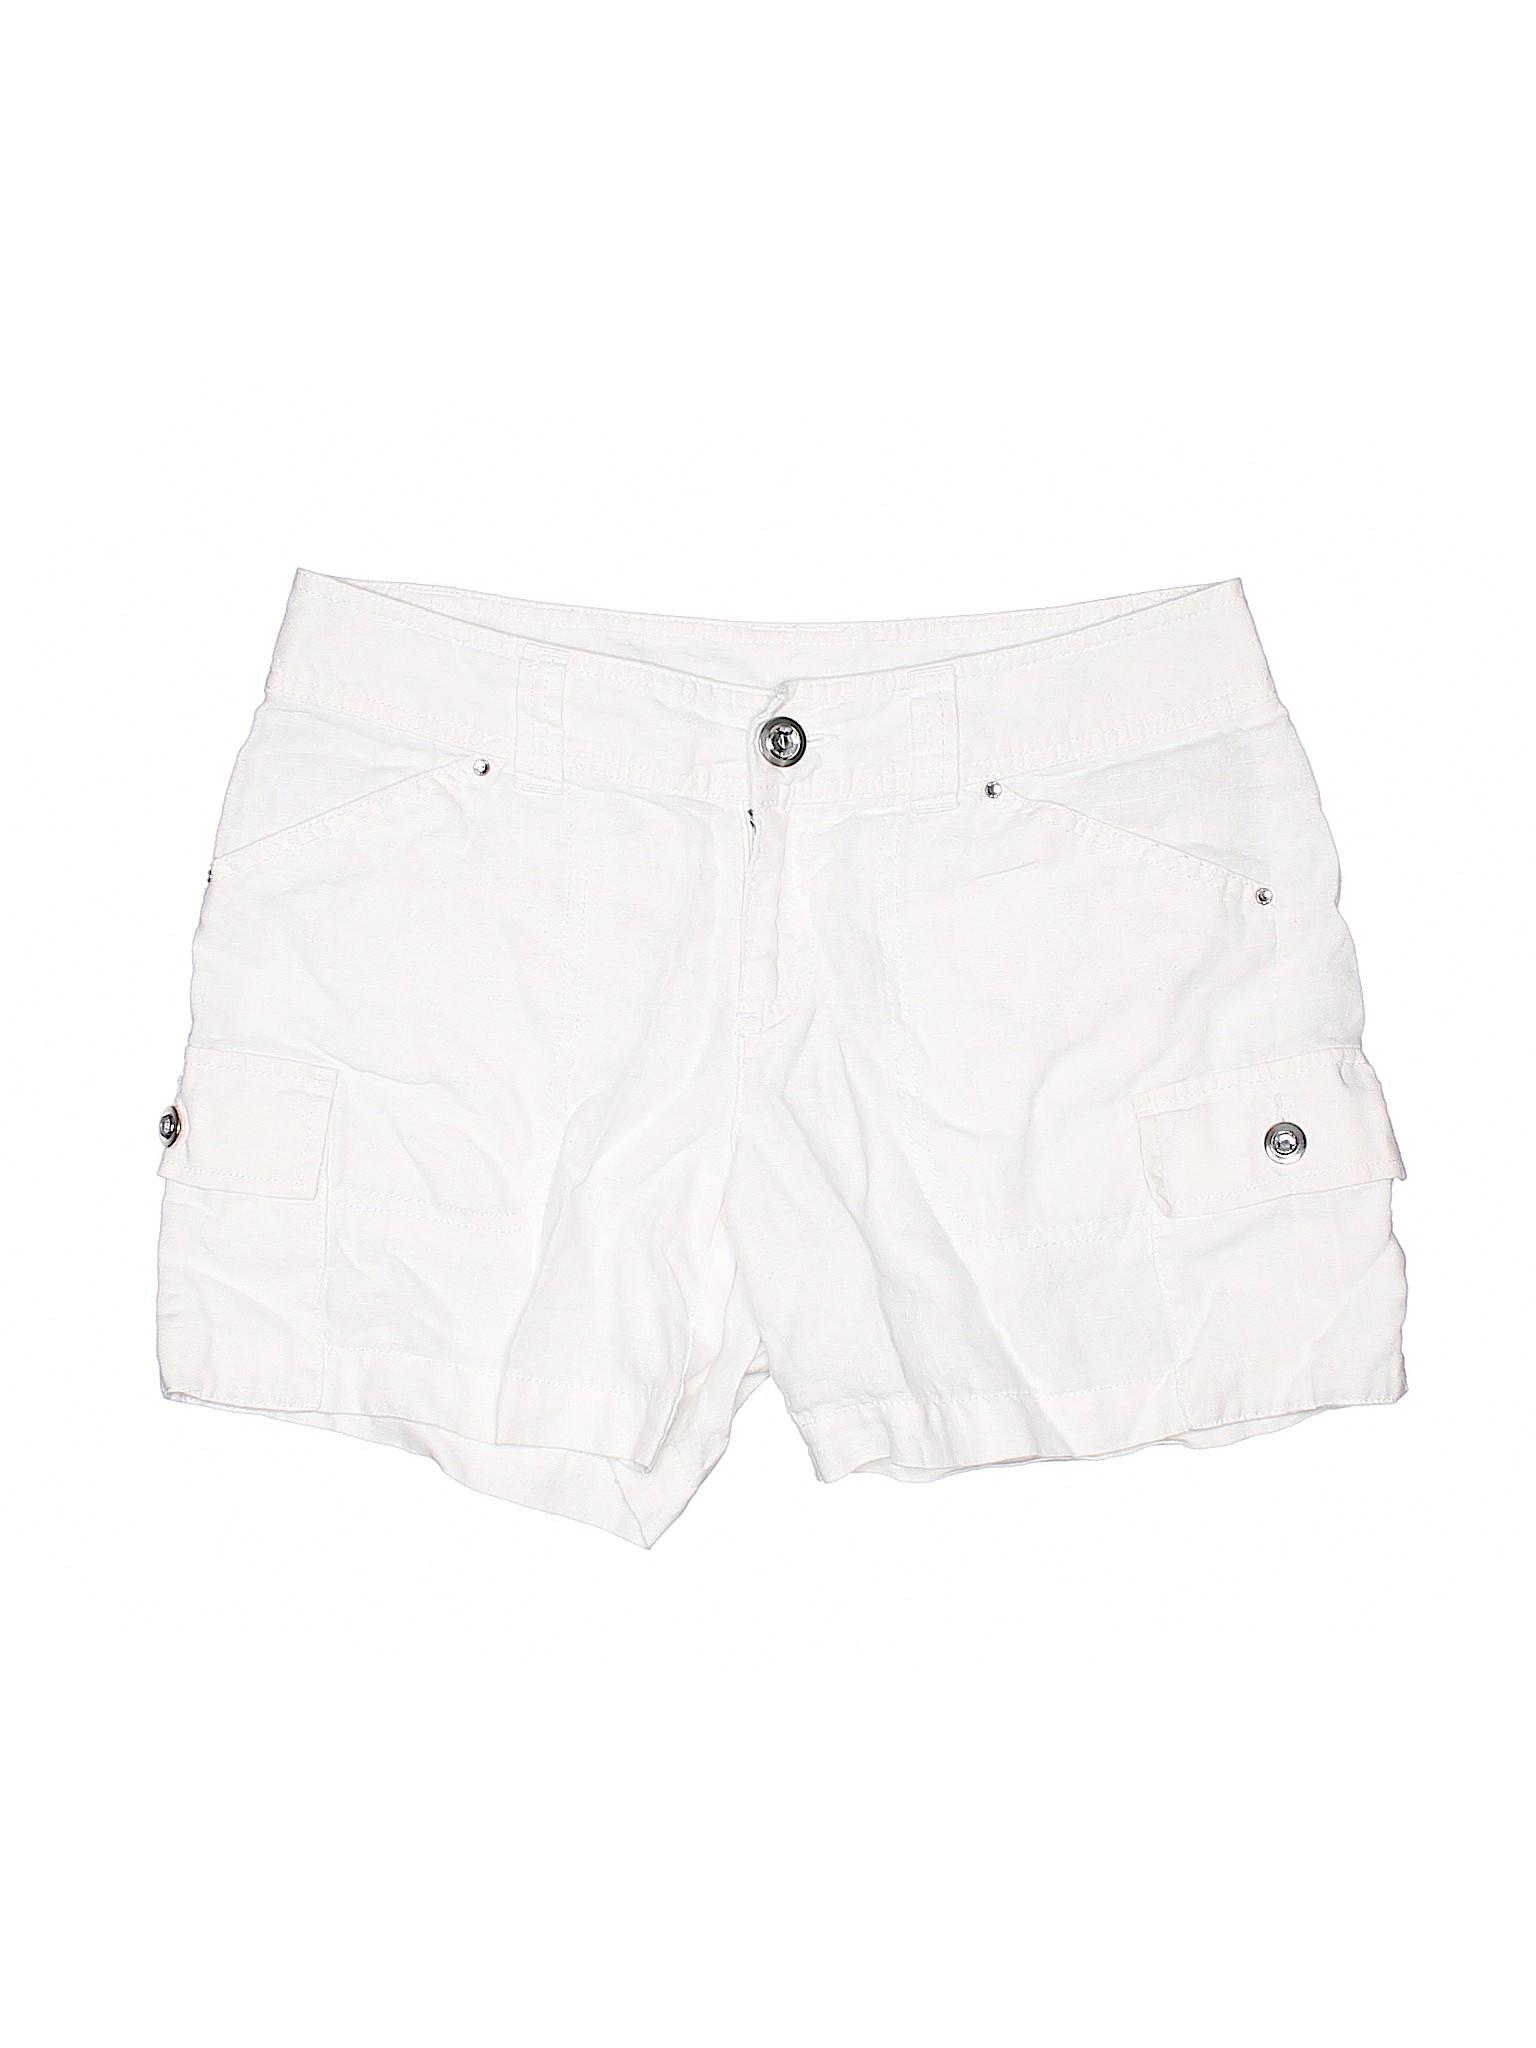 Boutique International INC Cargo Shorts Concepts Fw8aYrzq4w